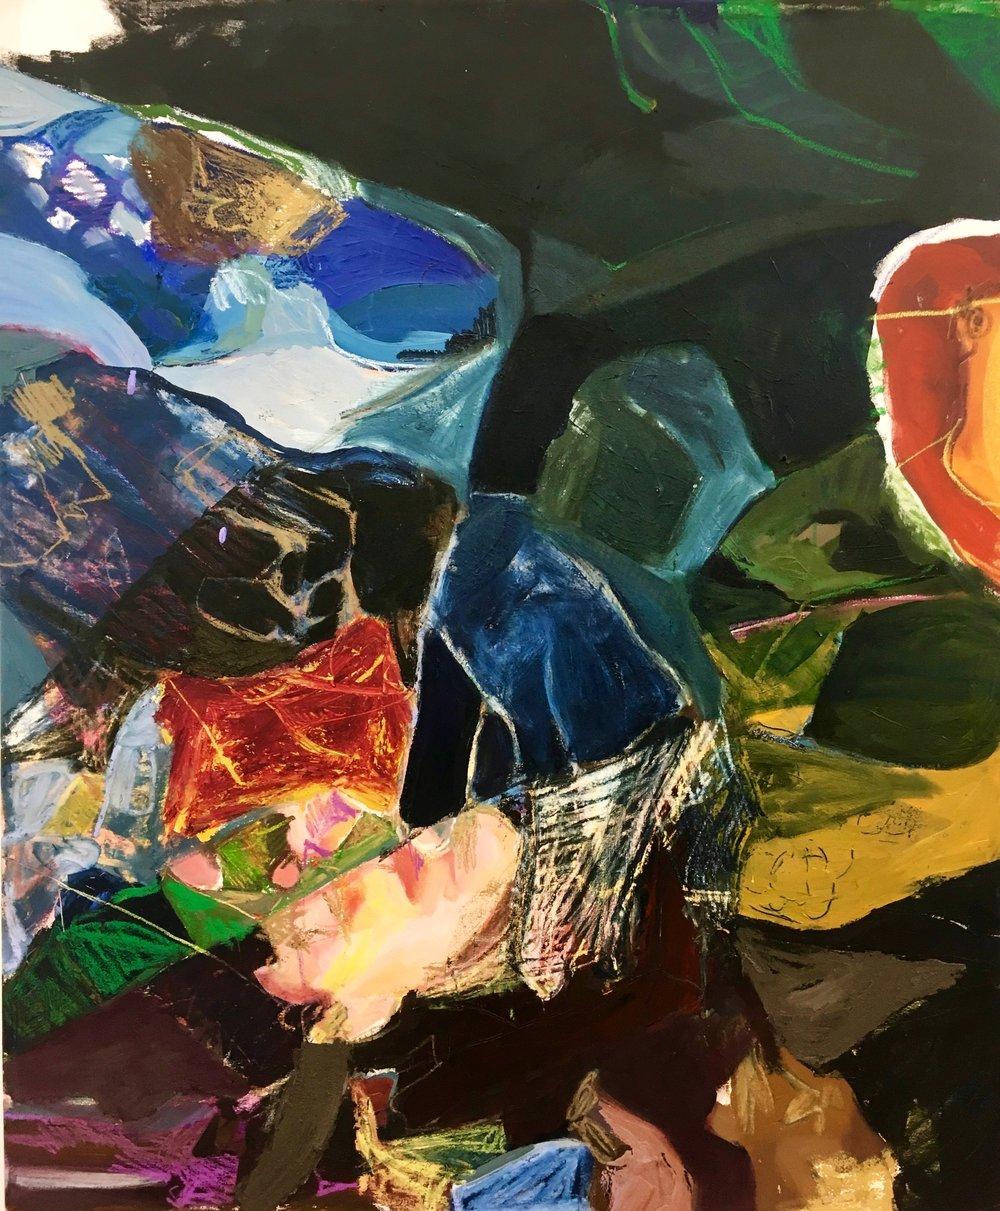 Untitled (spaghetti)  Oil, Bar on Canvas  48 x 59 IN  2018